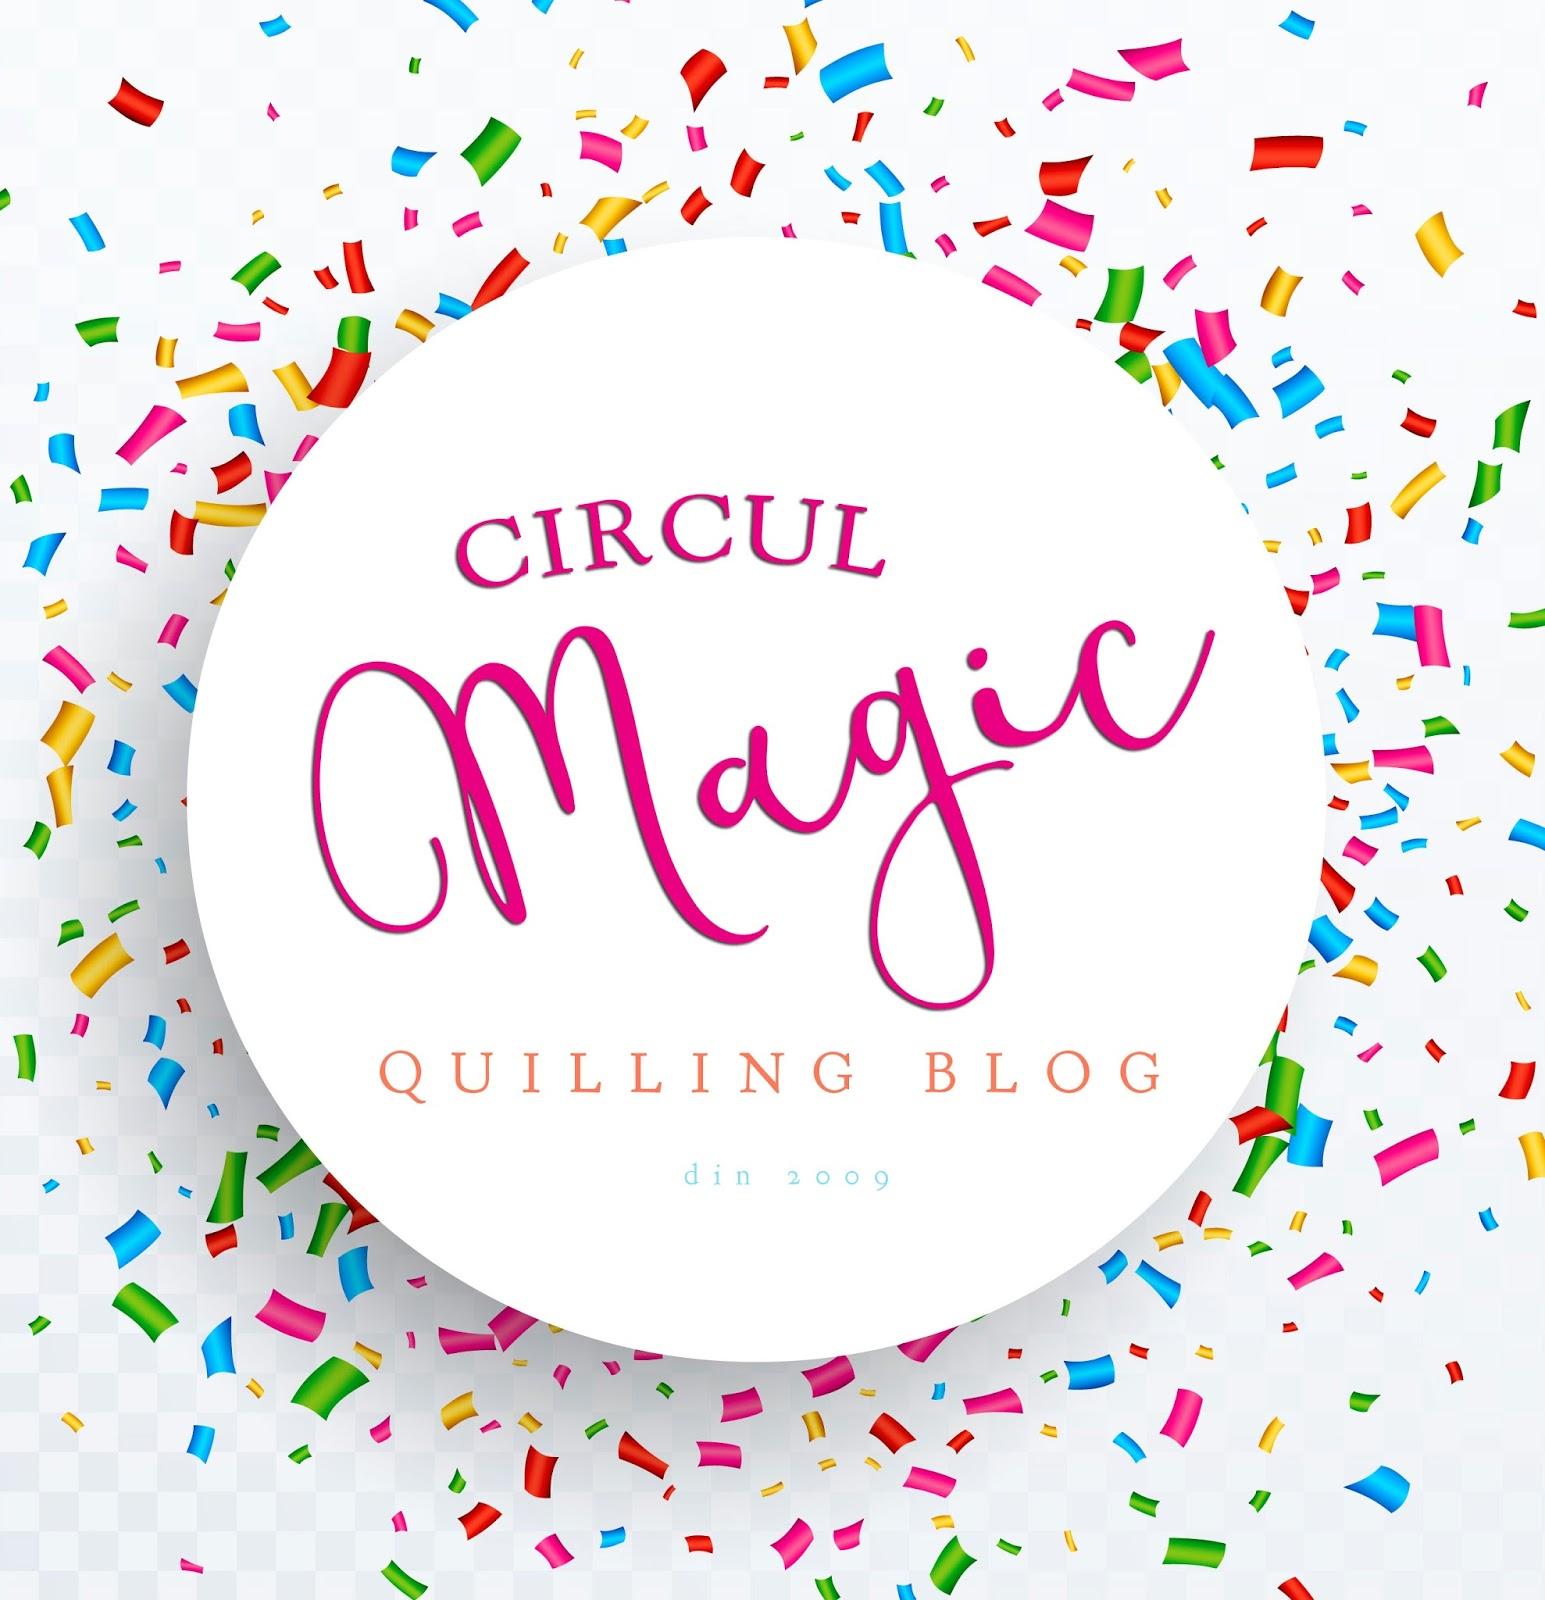 Un nou logo pentru Circul Magic, Quilling Blog